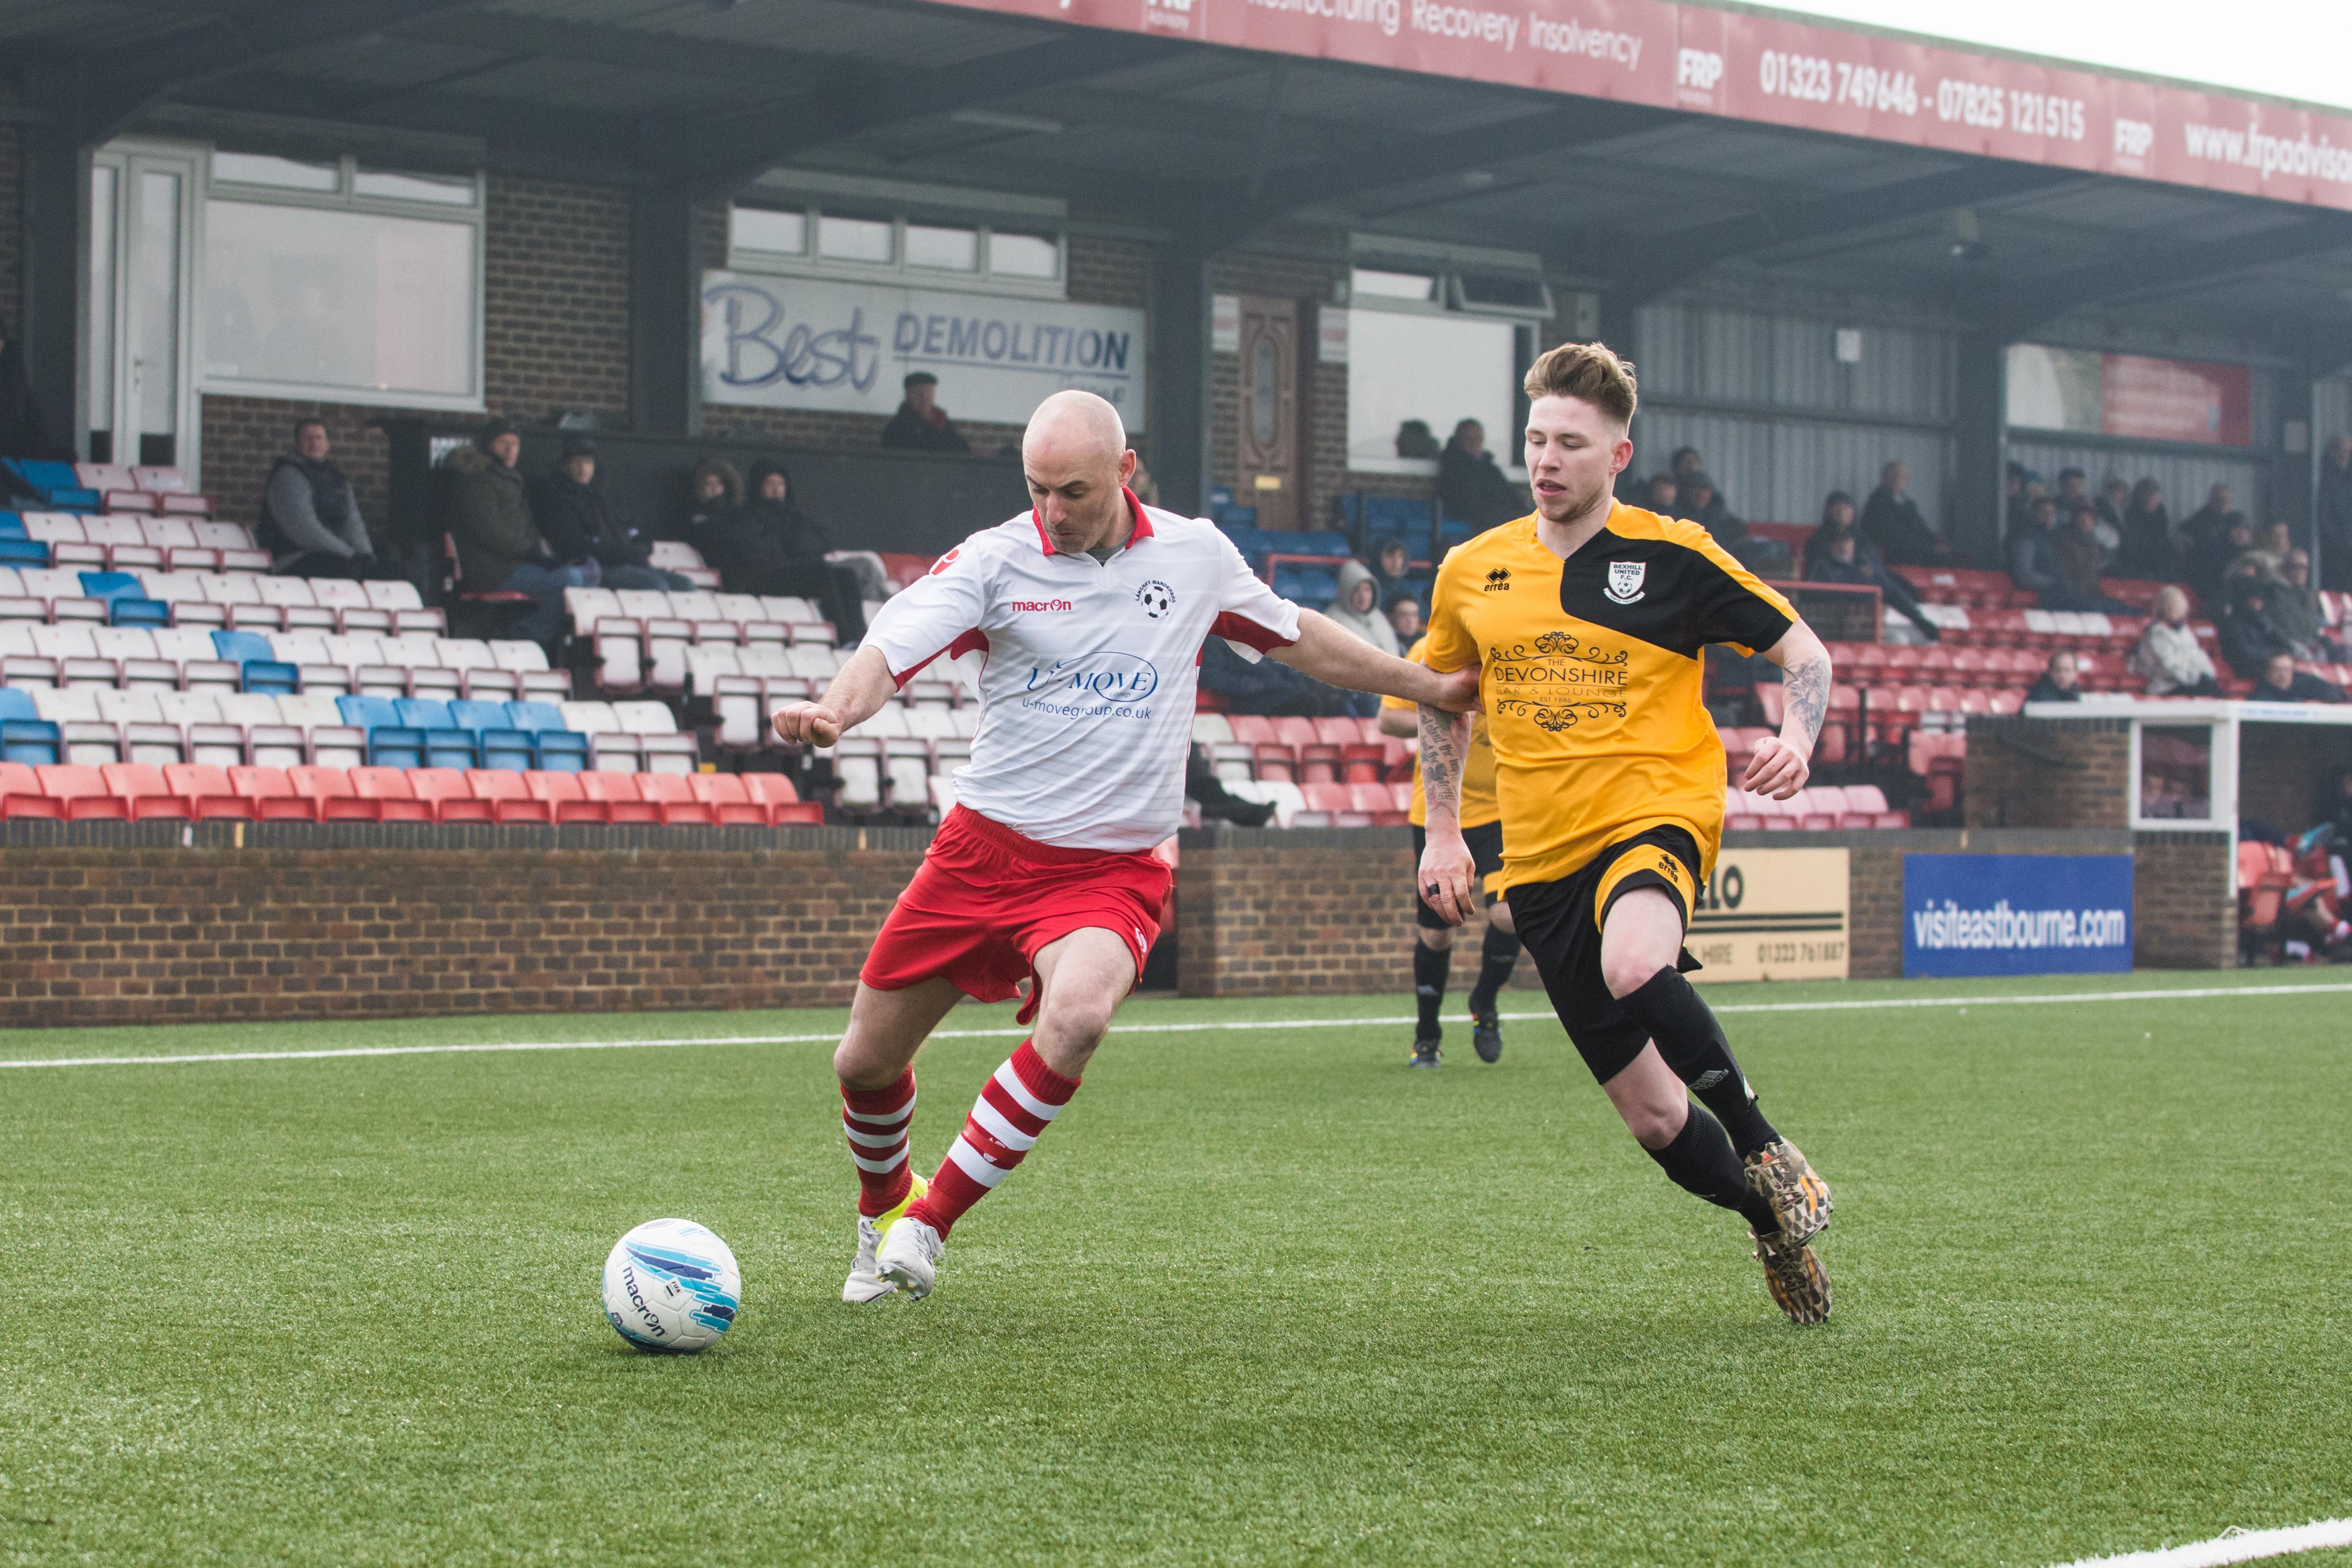 DAVID_JEFFERY Langney Wanderers FC vs Bexhill United FC 03.03.18 36